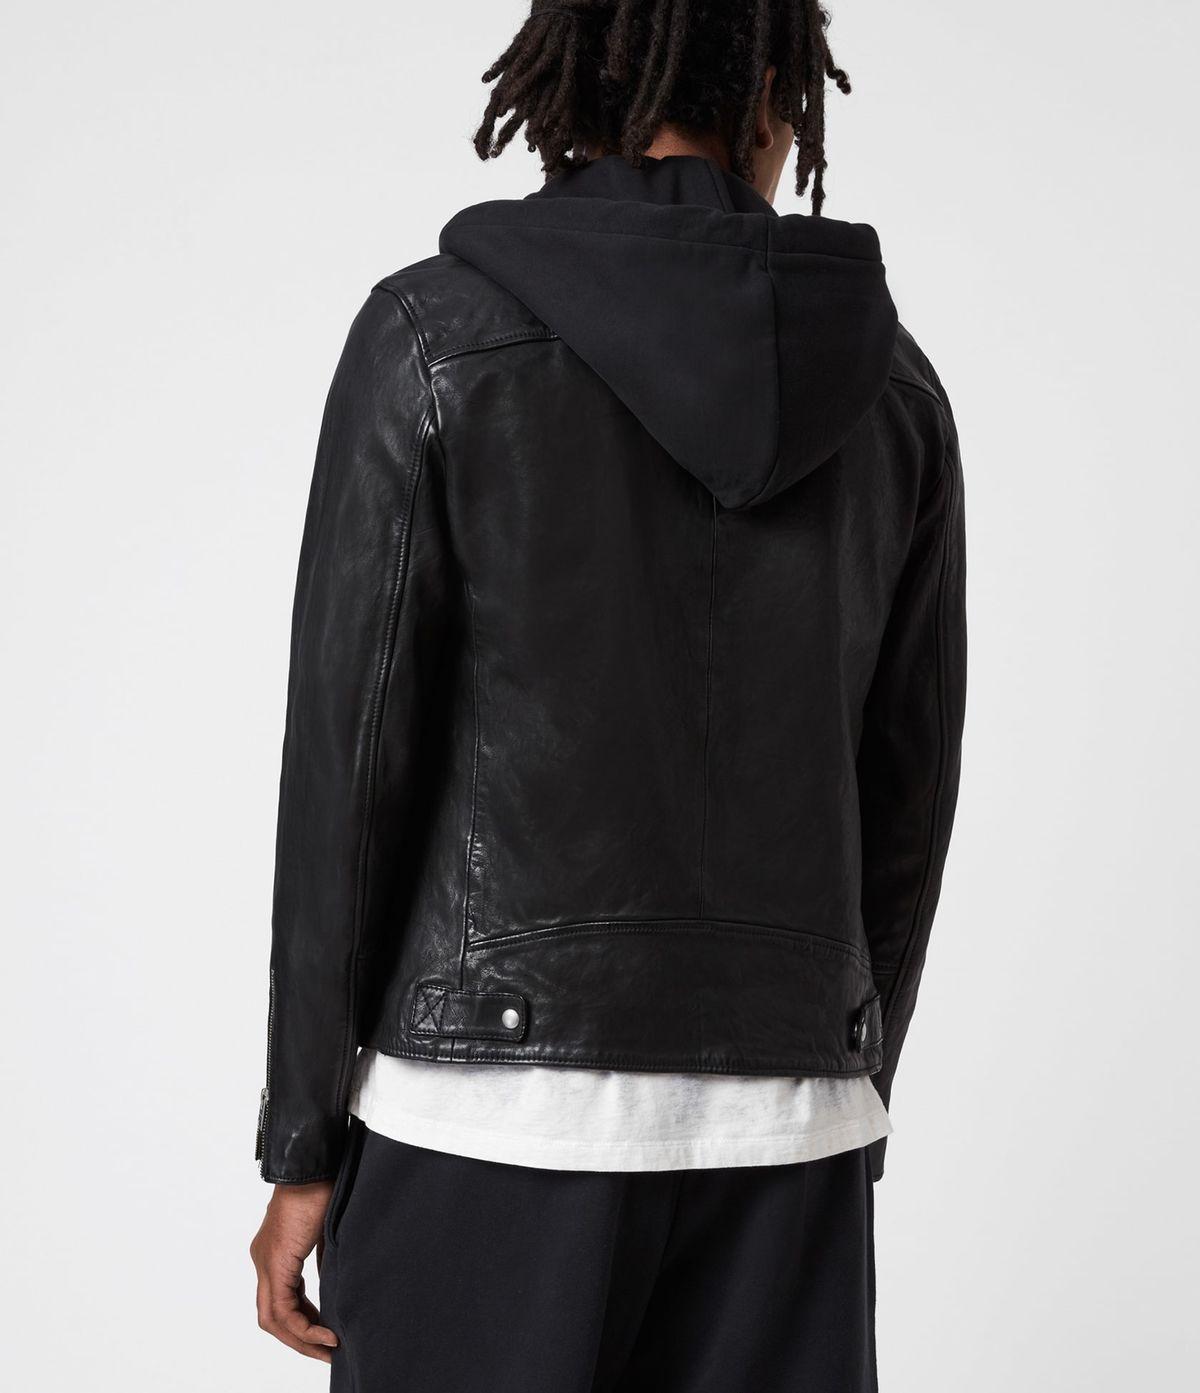 Men's Harwood Leather Jacket - Back View